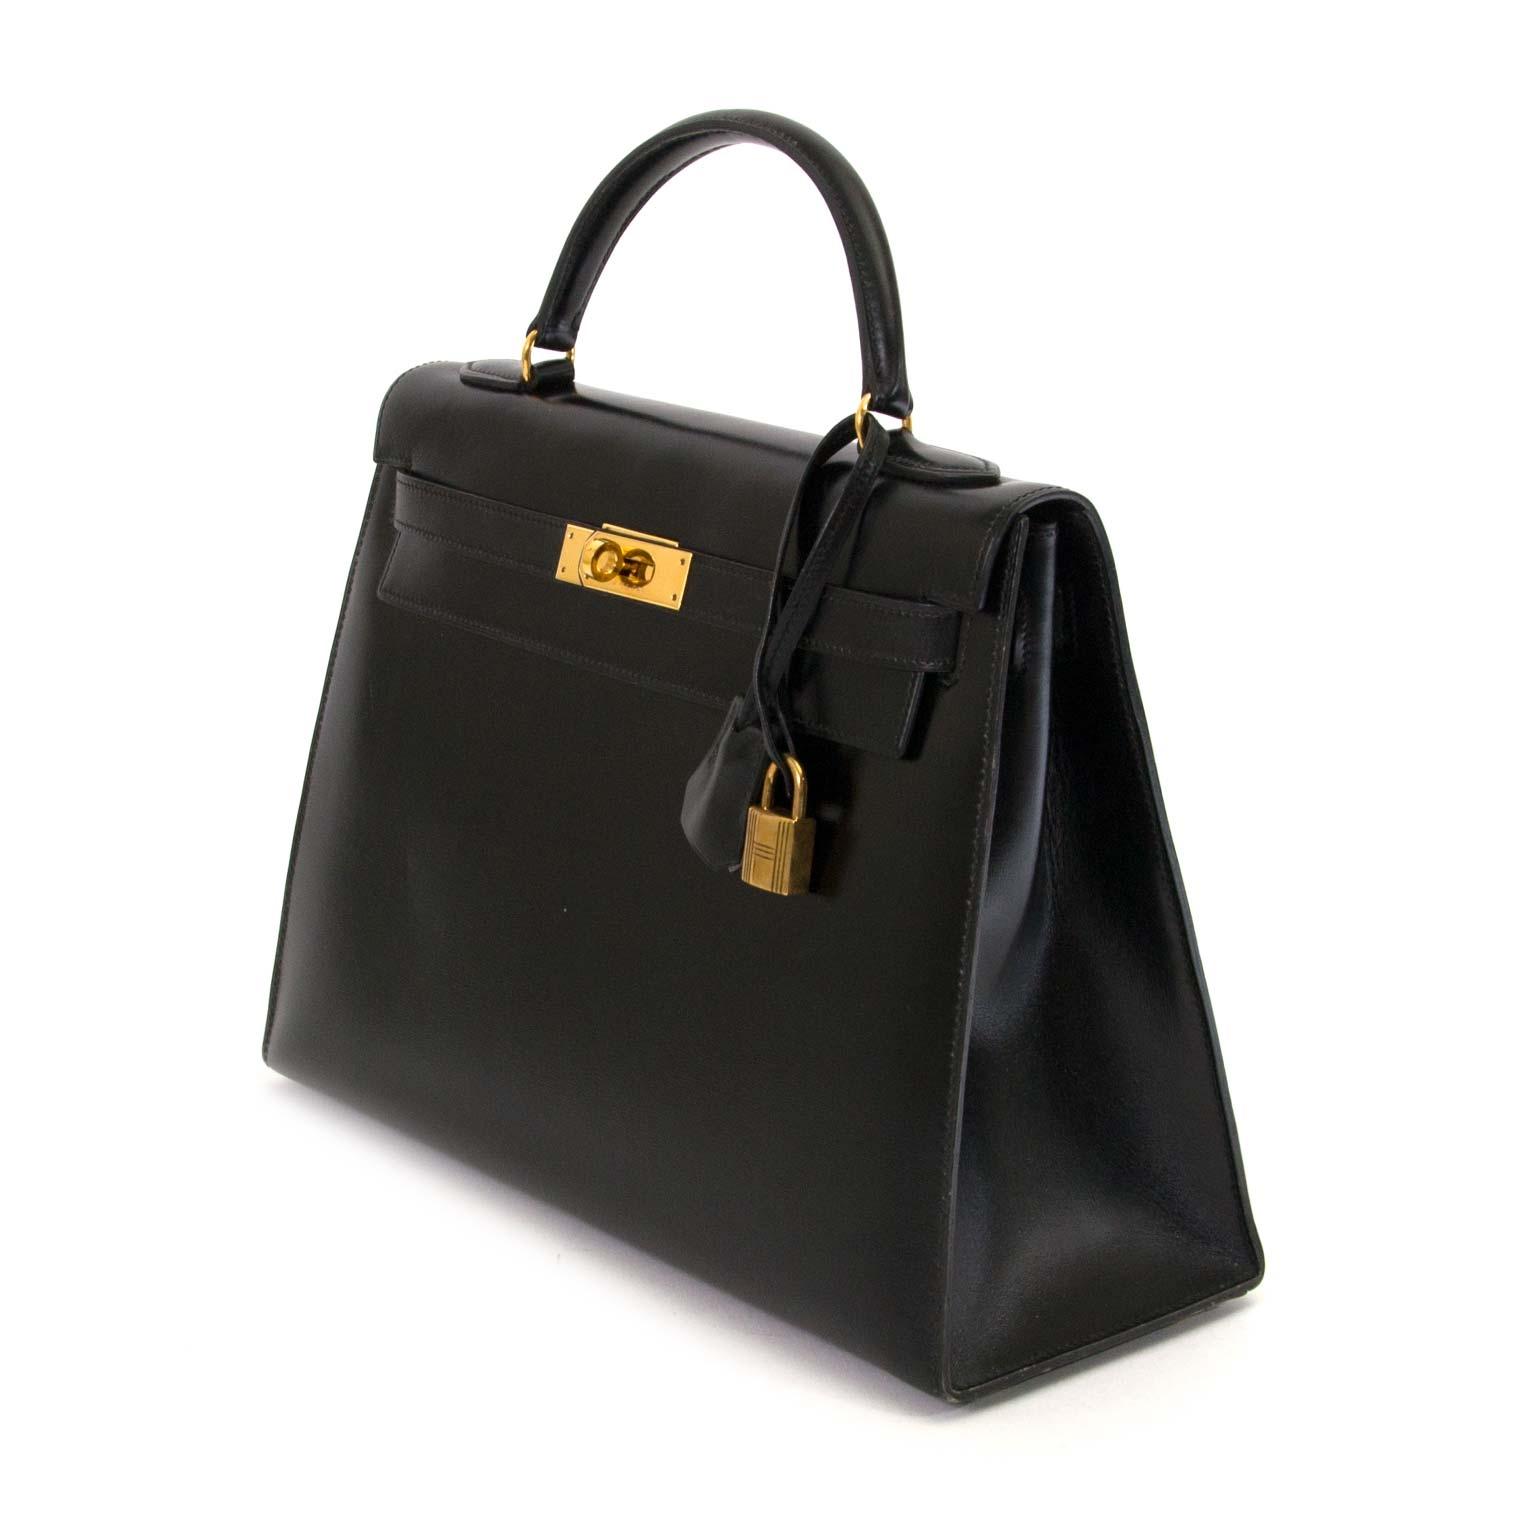 931a366e79cc ... Hermès Kelly 32 Black Box Calf GHW kopen en verkopen aan de beste prijs  bij Labellov